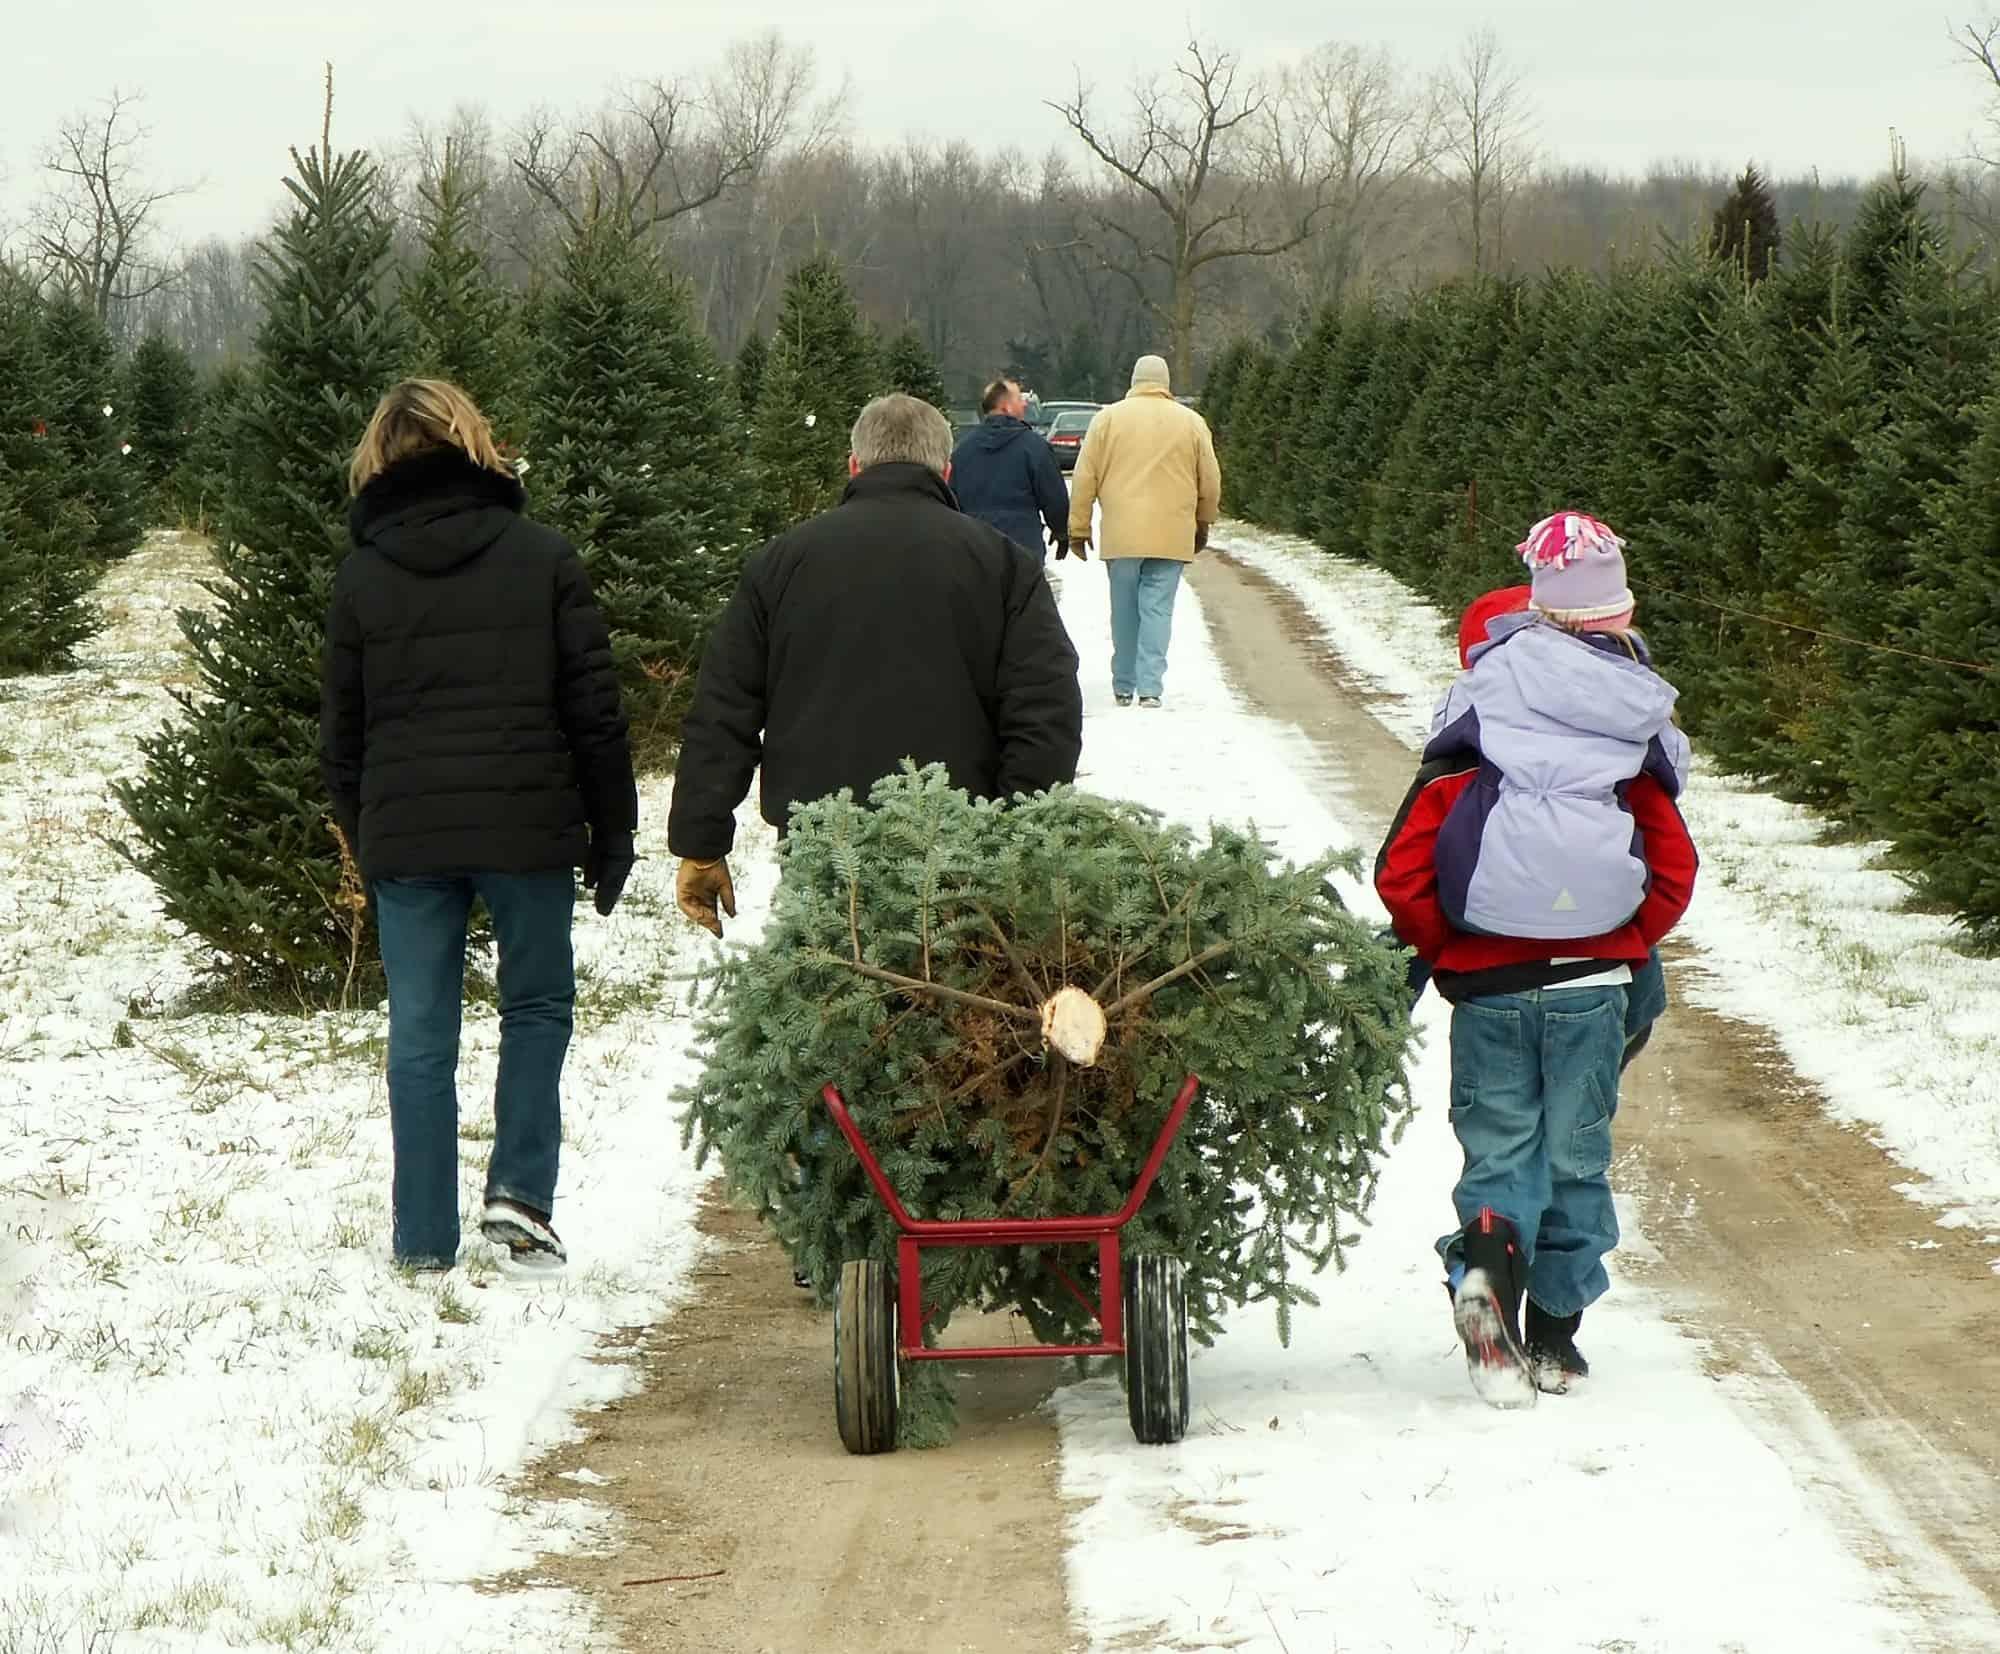 U-Cut Christmas Tree Farms: Cutting Down Your Own Tree